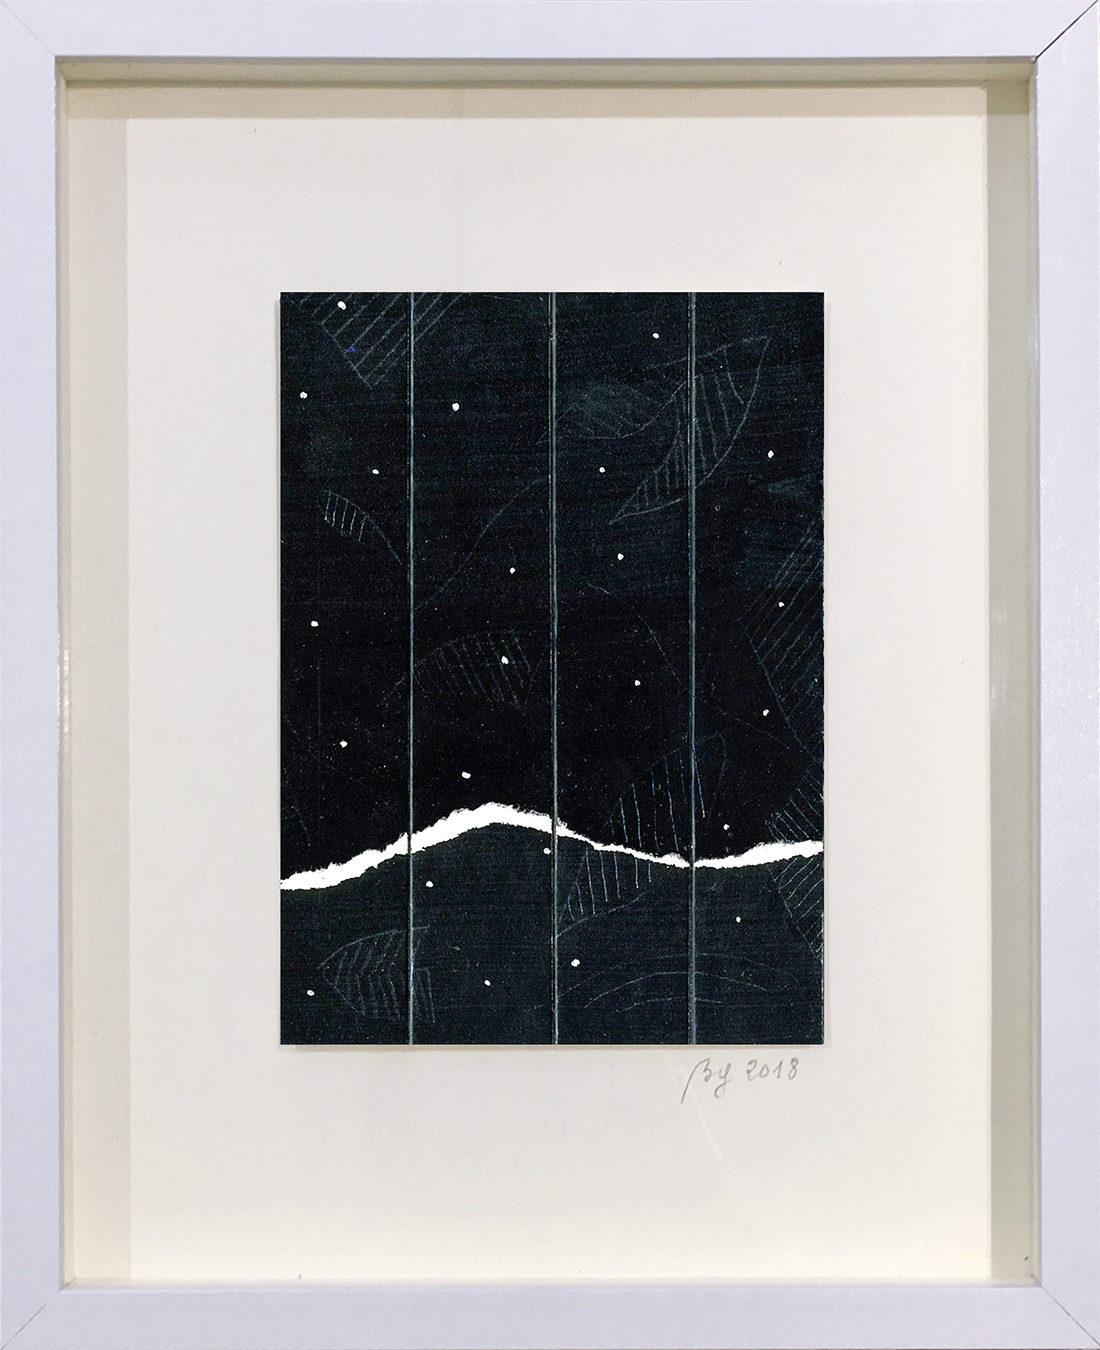 Bernard Gortais - Oeuvre sur papier - Continuum 139